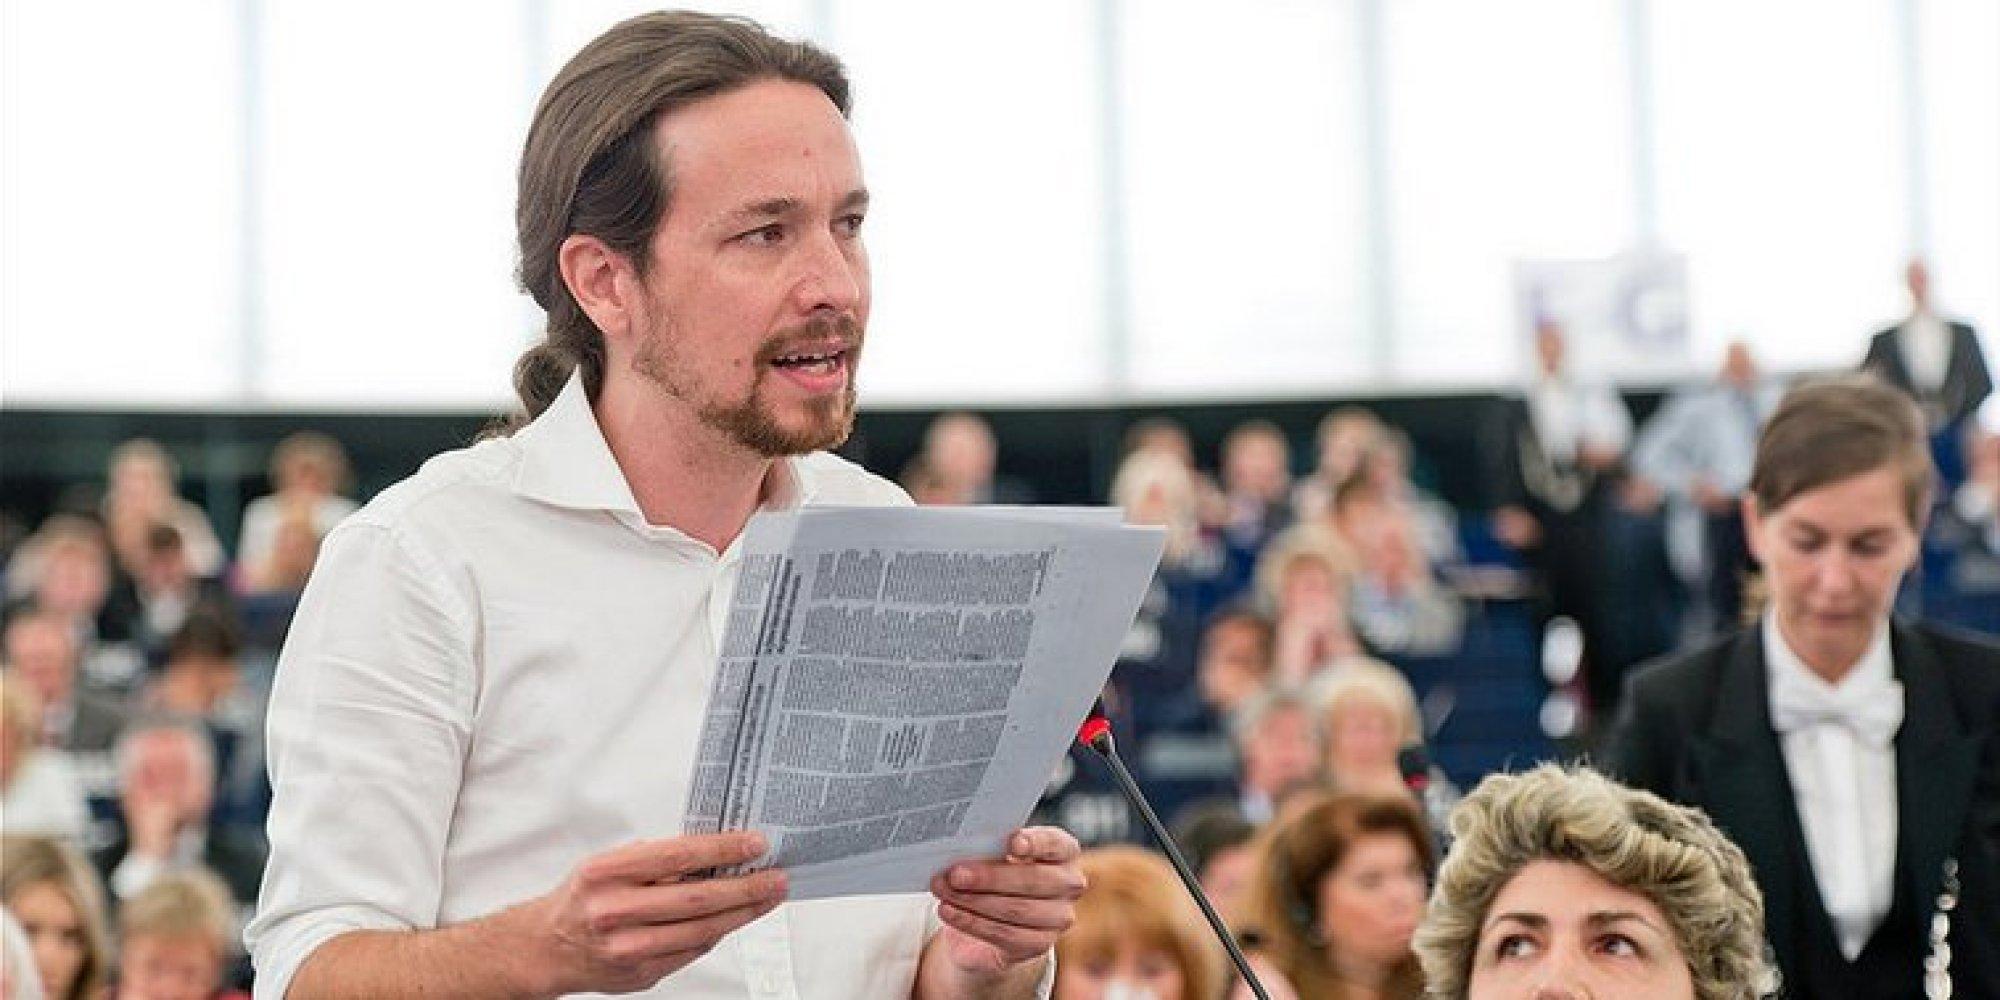 Entrevista completa, en castellano, de Pablo Iglesias sobre la polémica «Trágico Problema Político vasco» a 'New Left Review'